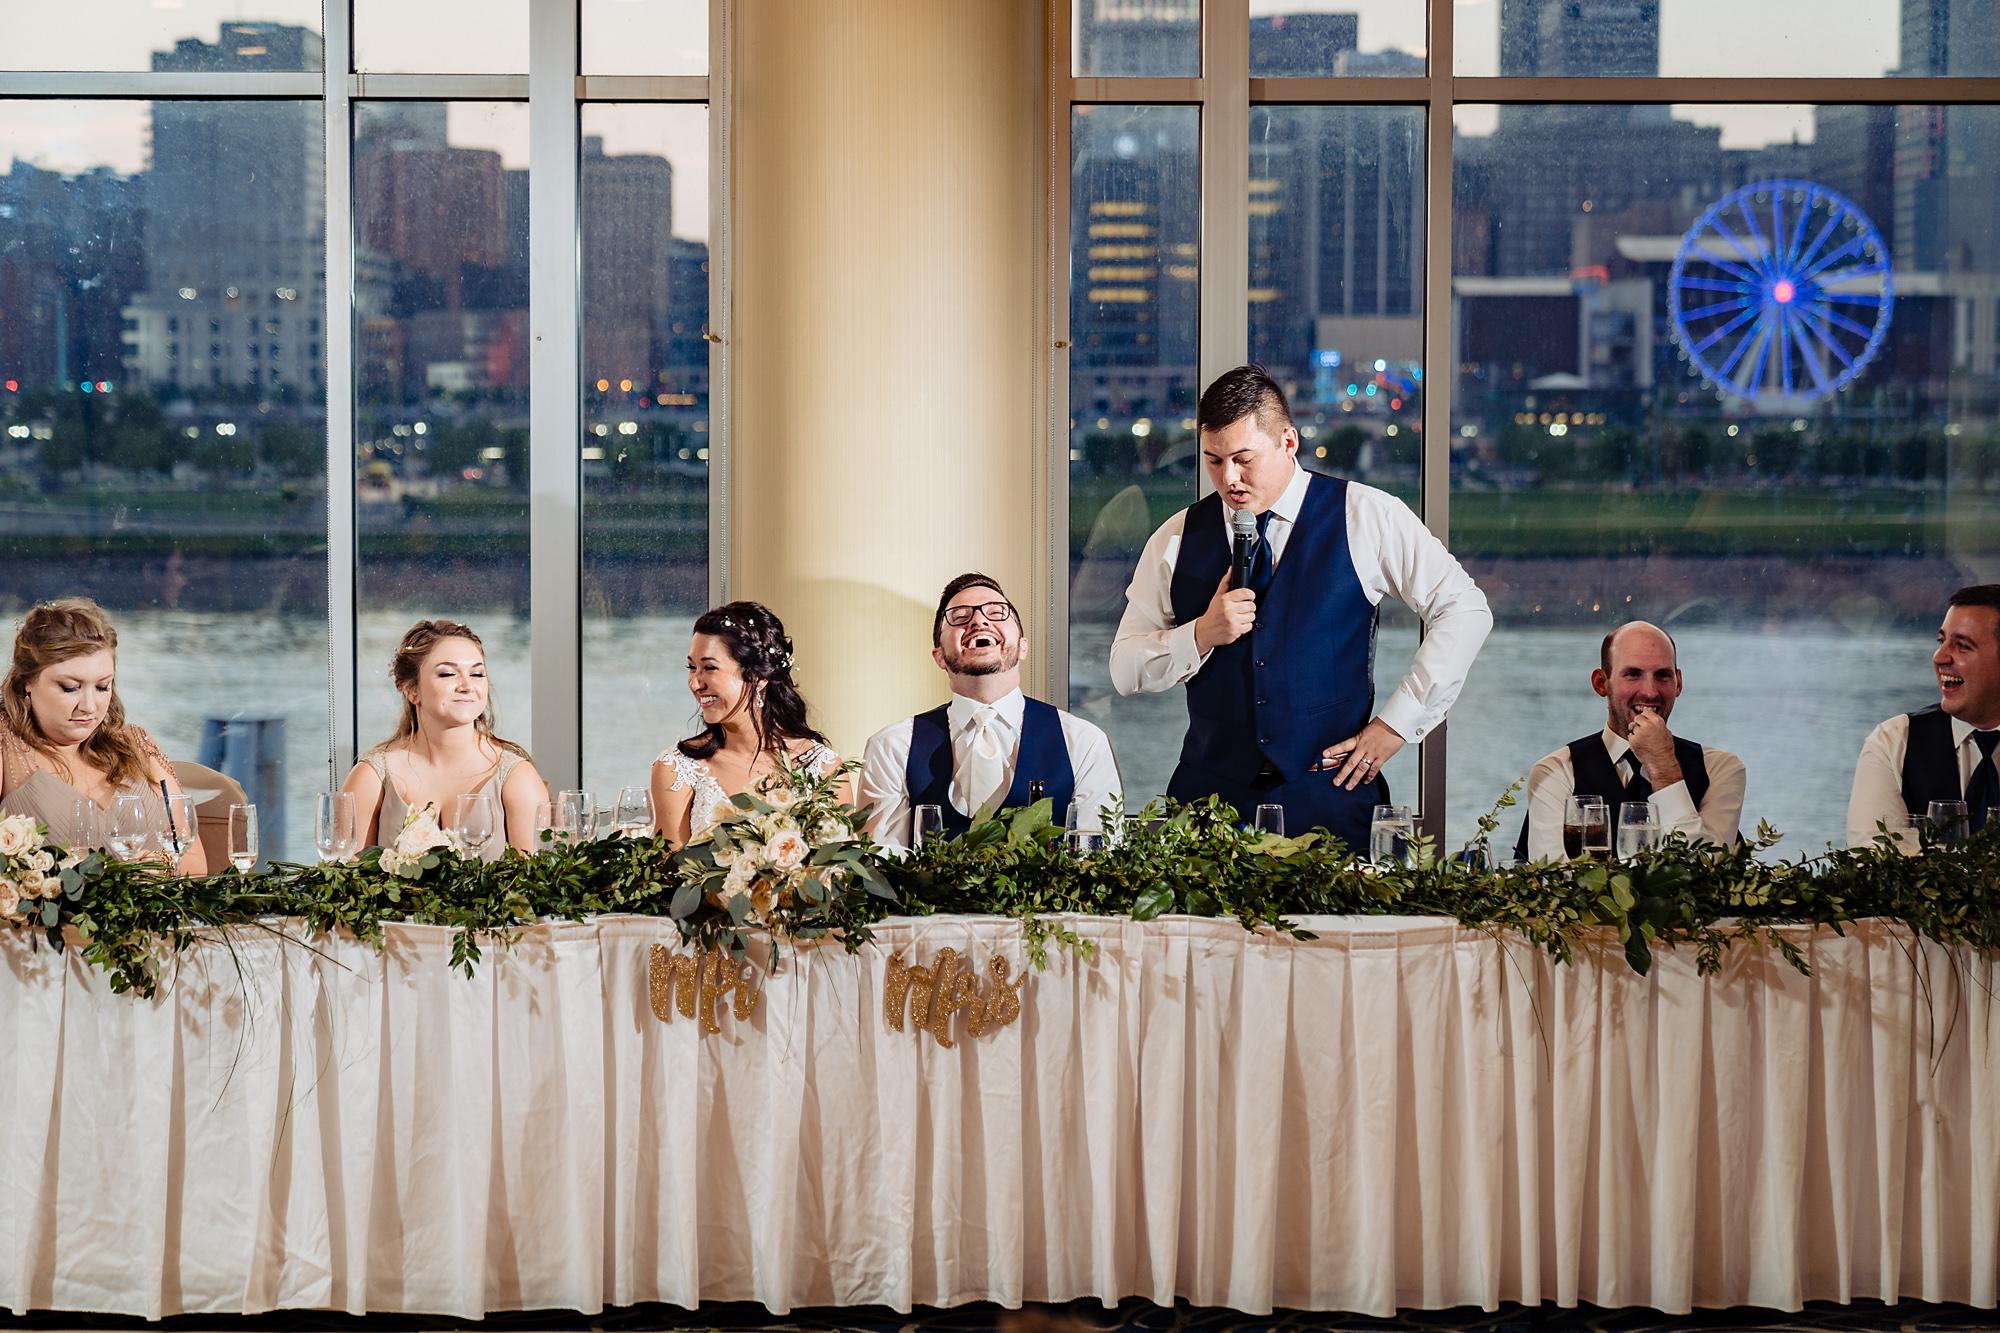 Embassy-Suites-Rivercenter-Wedding-Photography-32.jpg